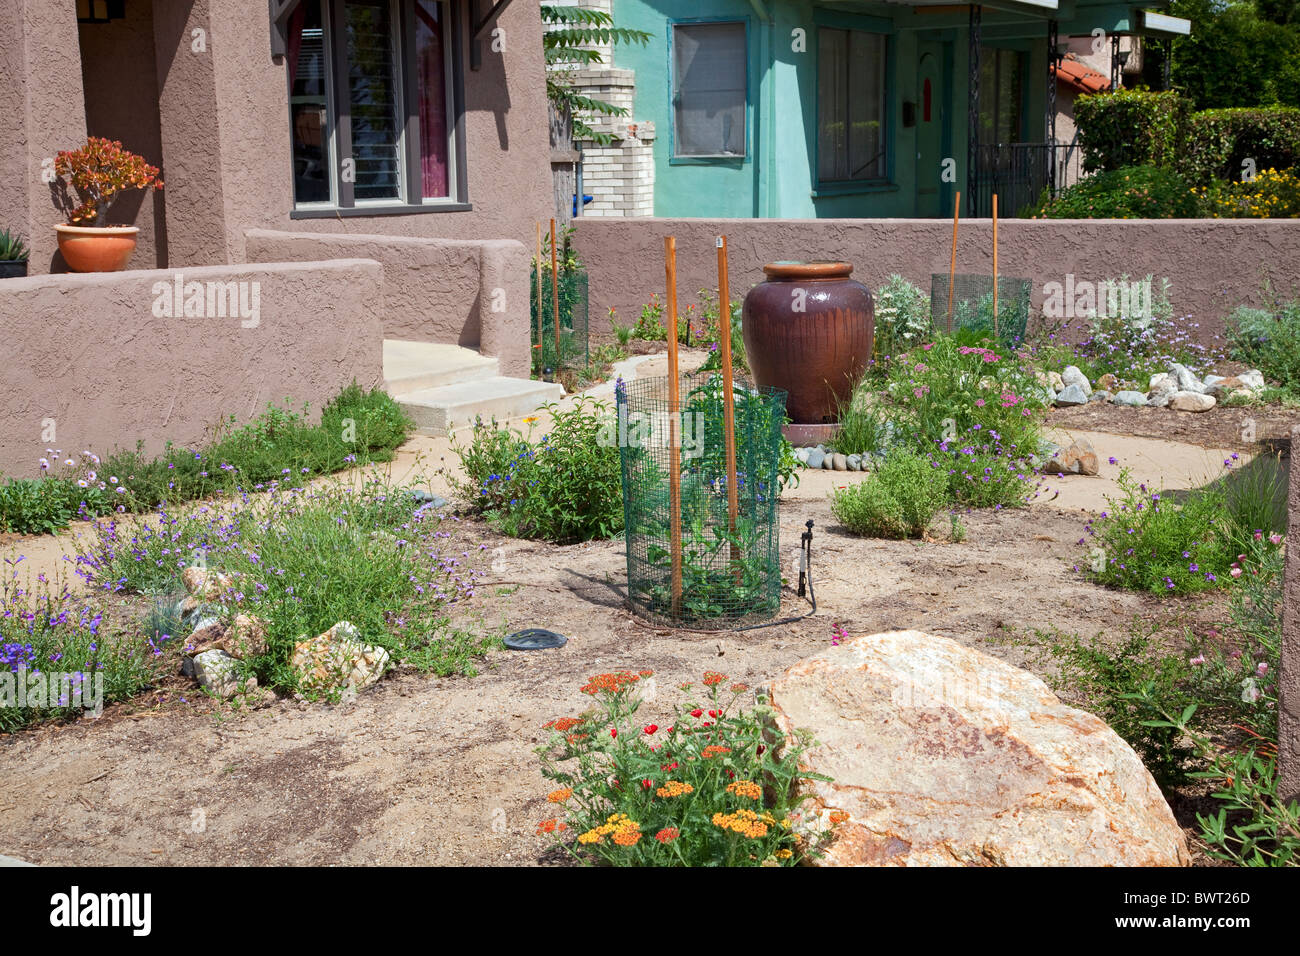 Drought Tolerant Garden, Atwater Village, Los Angeles, California, USA    Stock Image